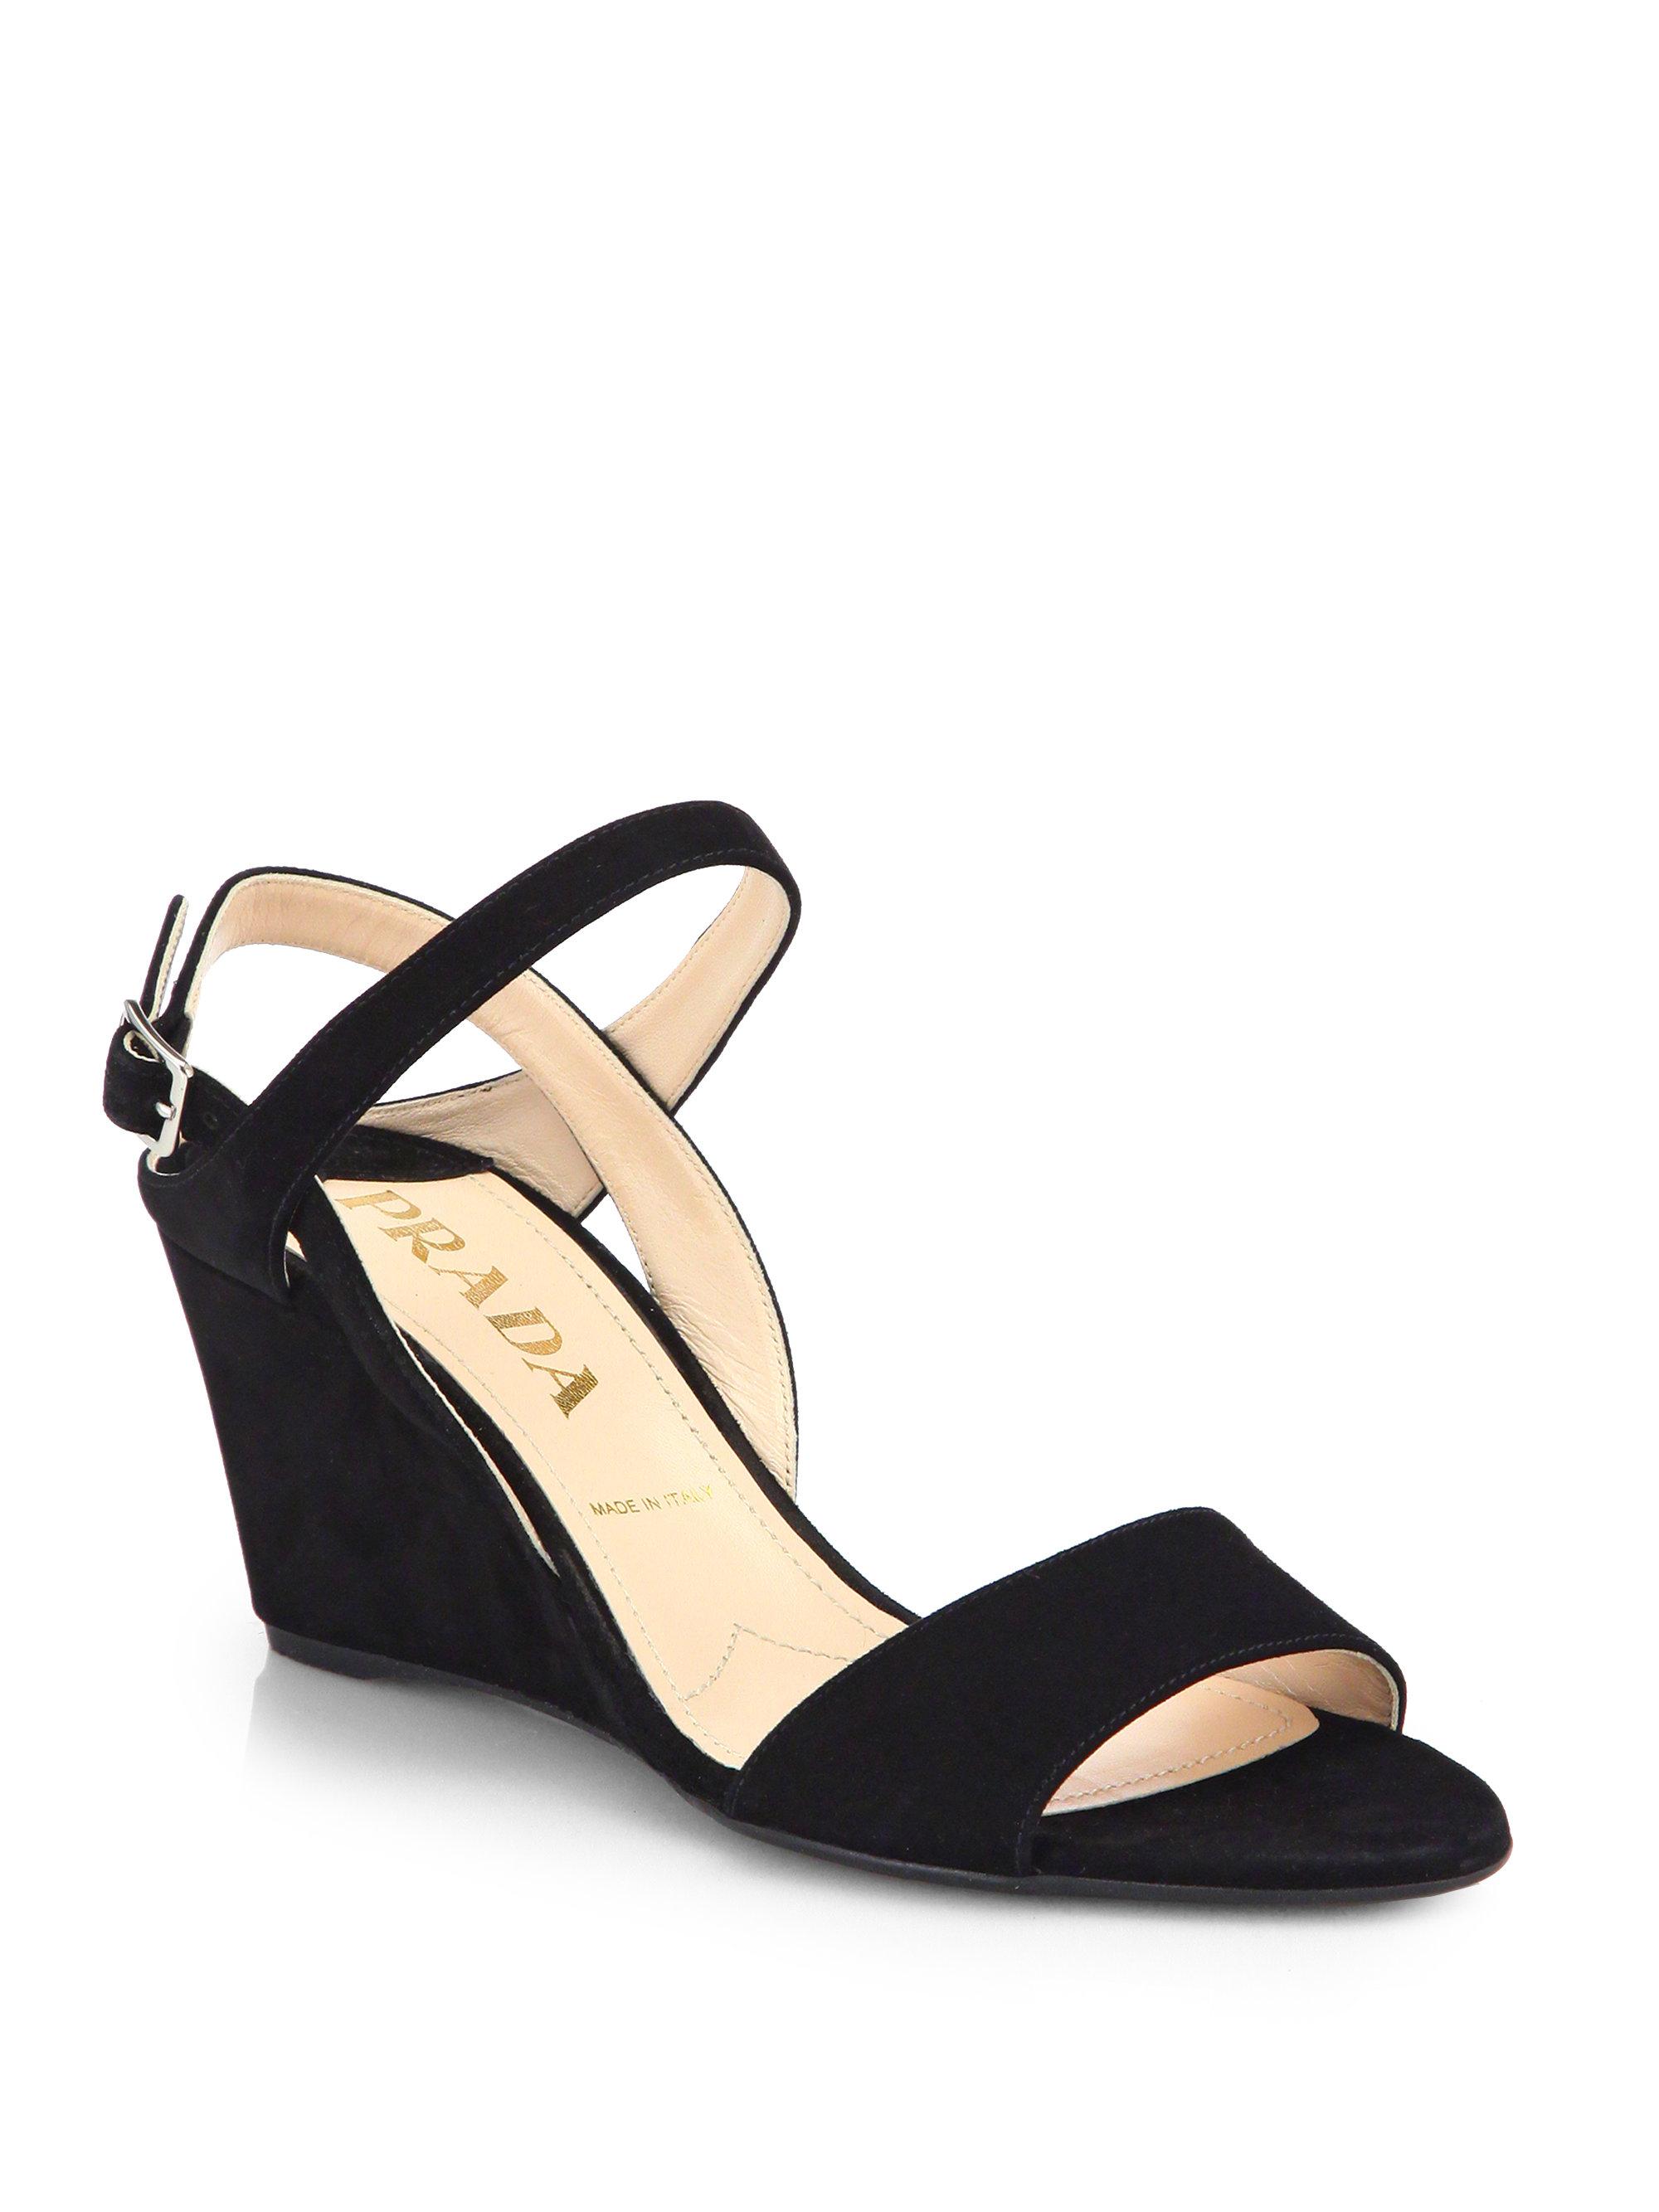 d4dd566017d Lyst - Prada Suede Slingback Wedge Sandals in Black